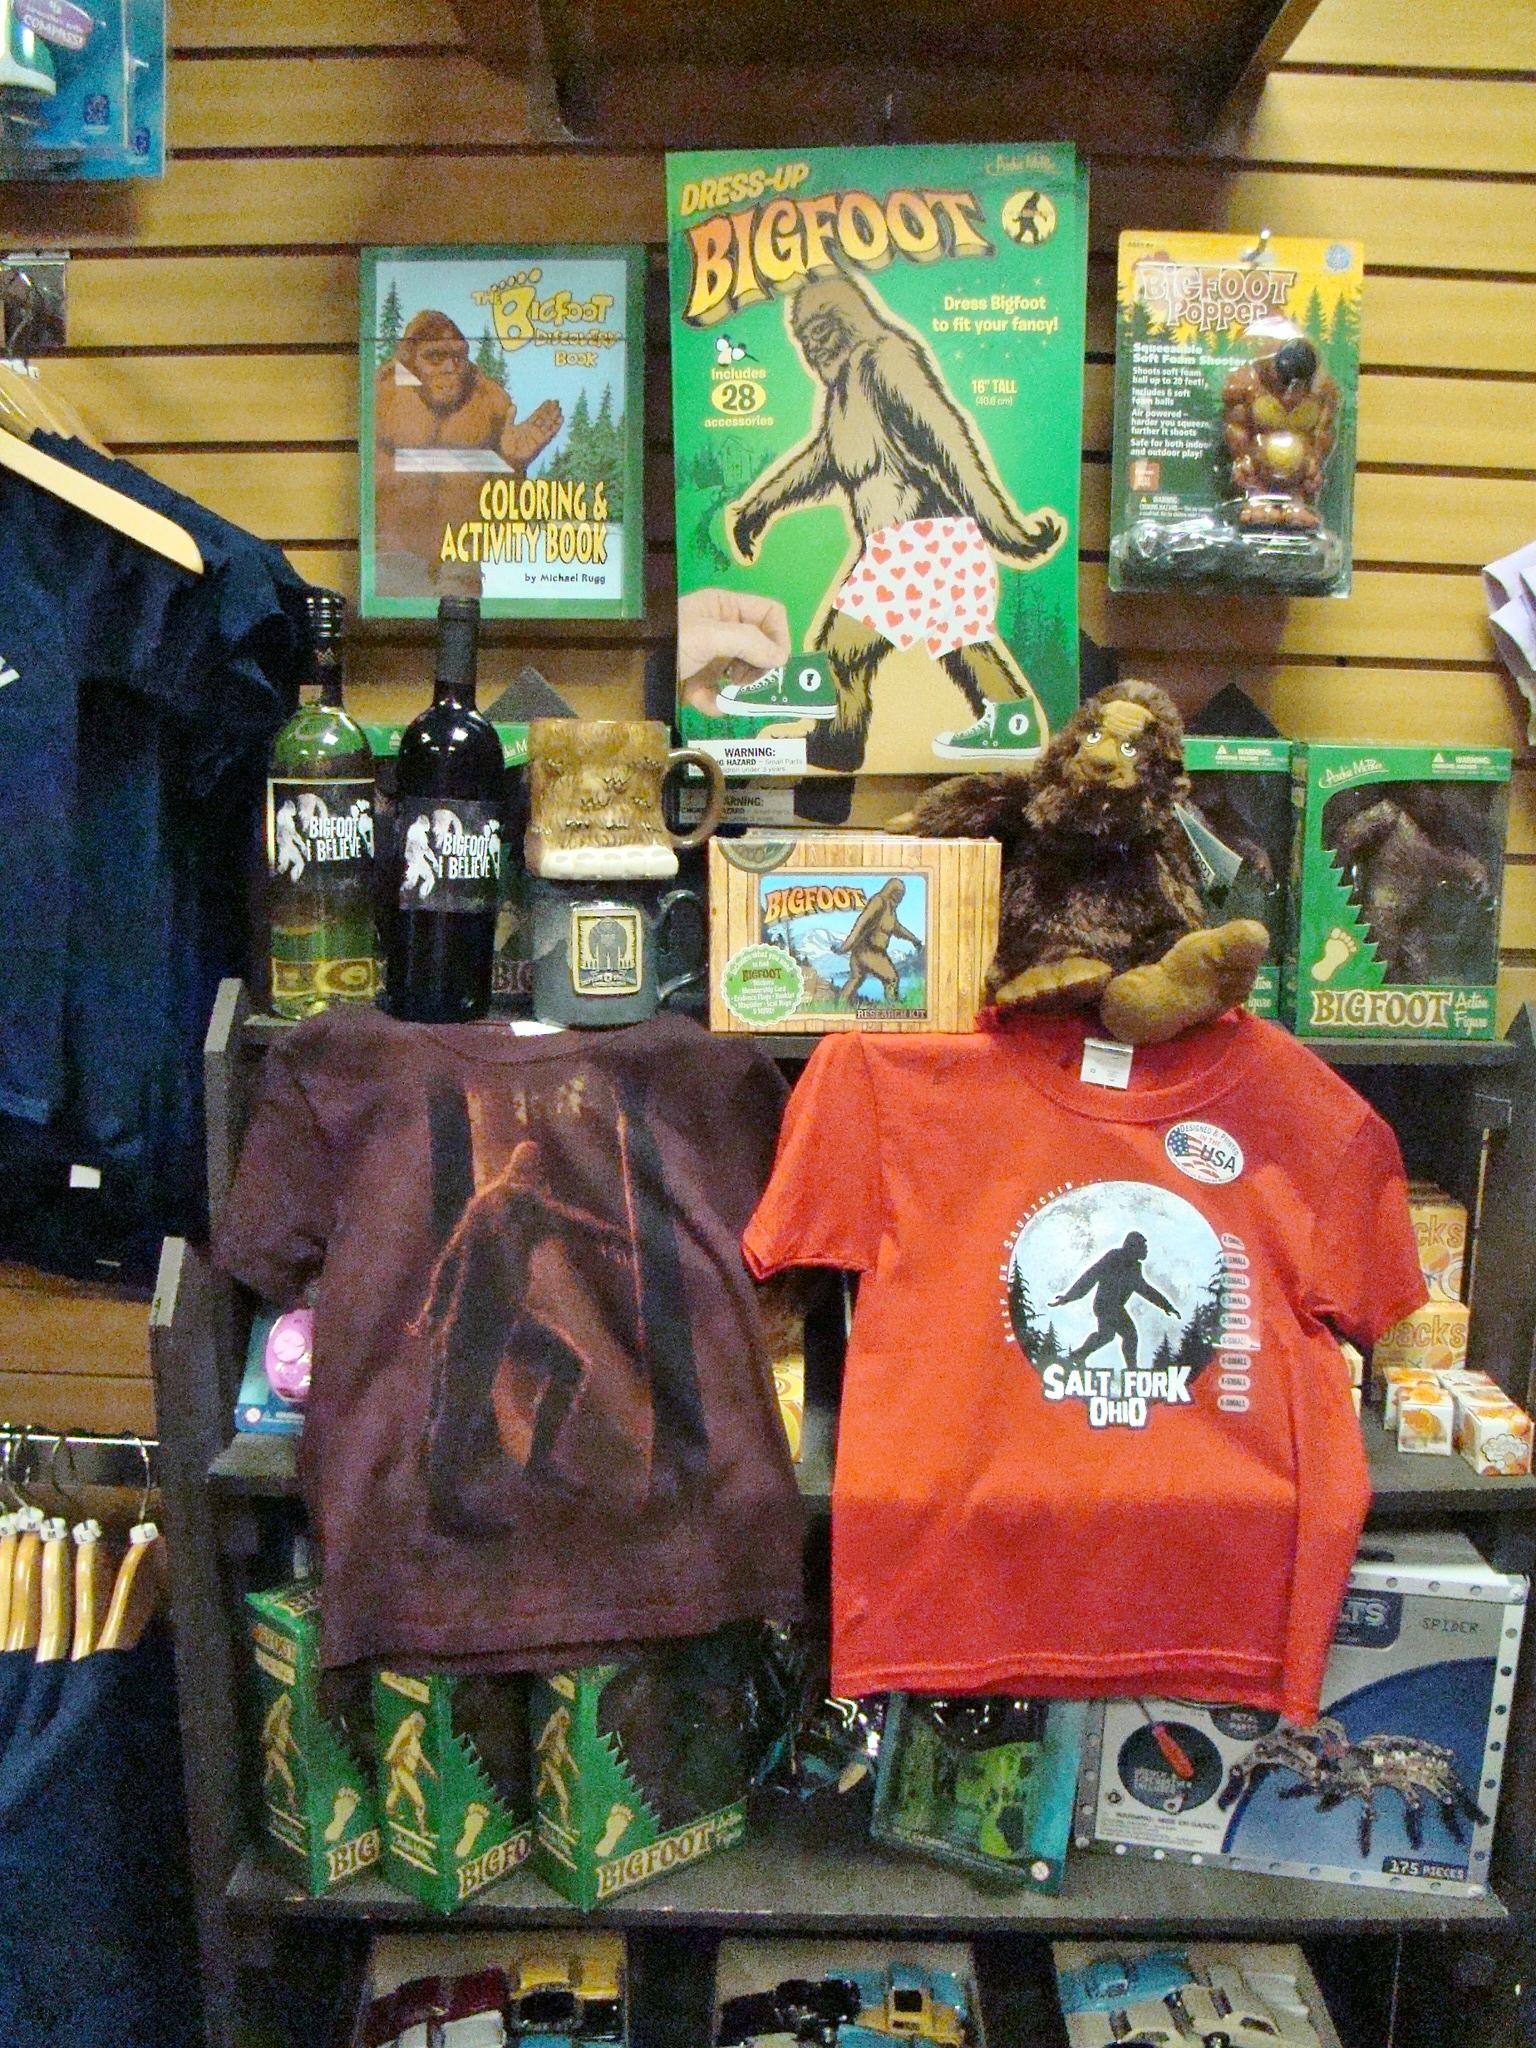 Bigfoot Gift Shop